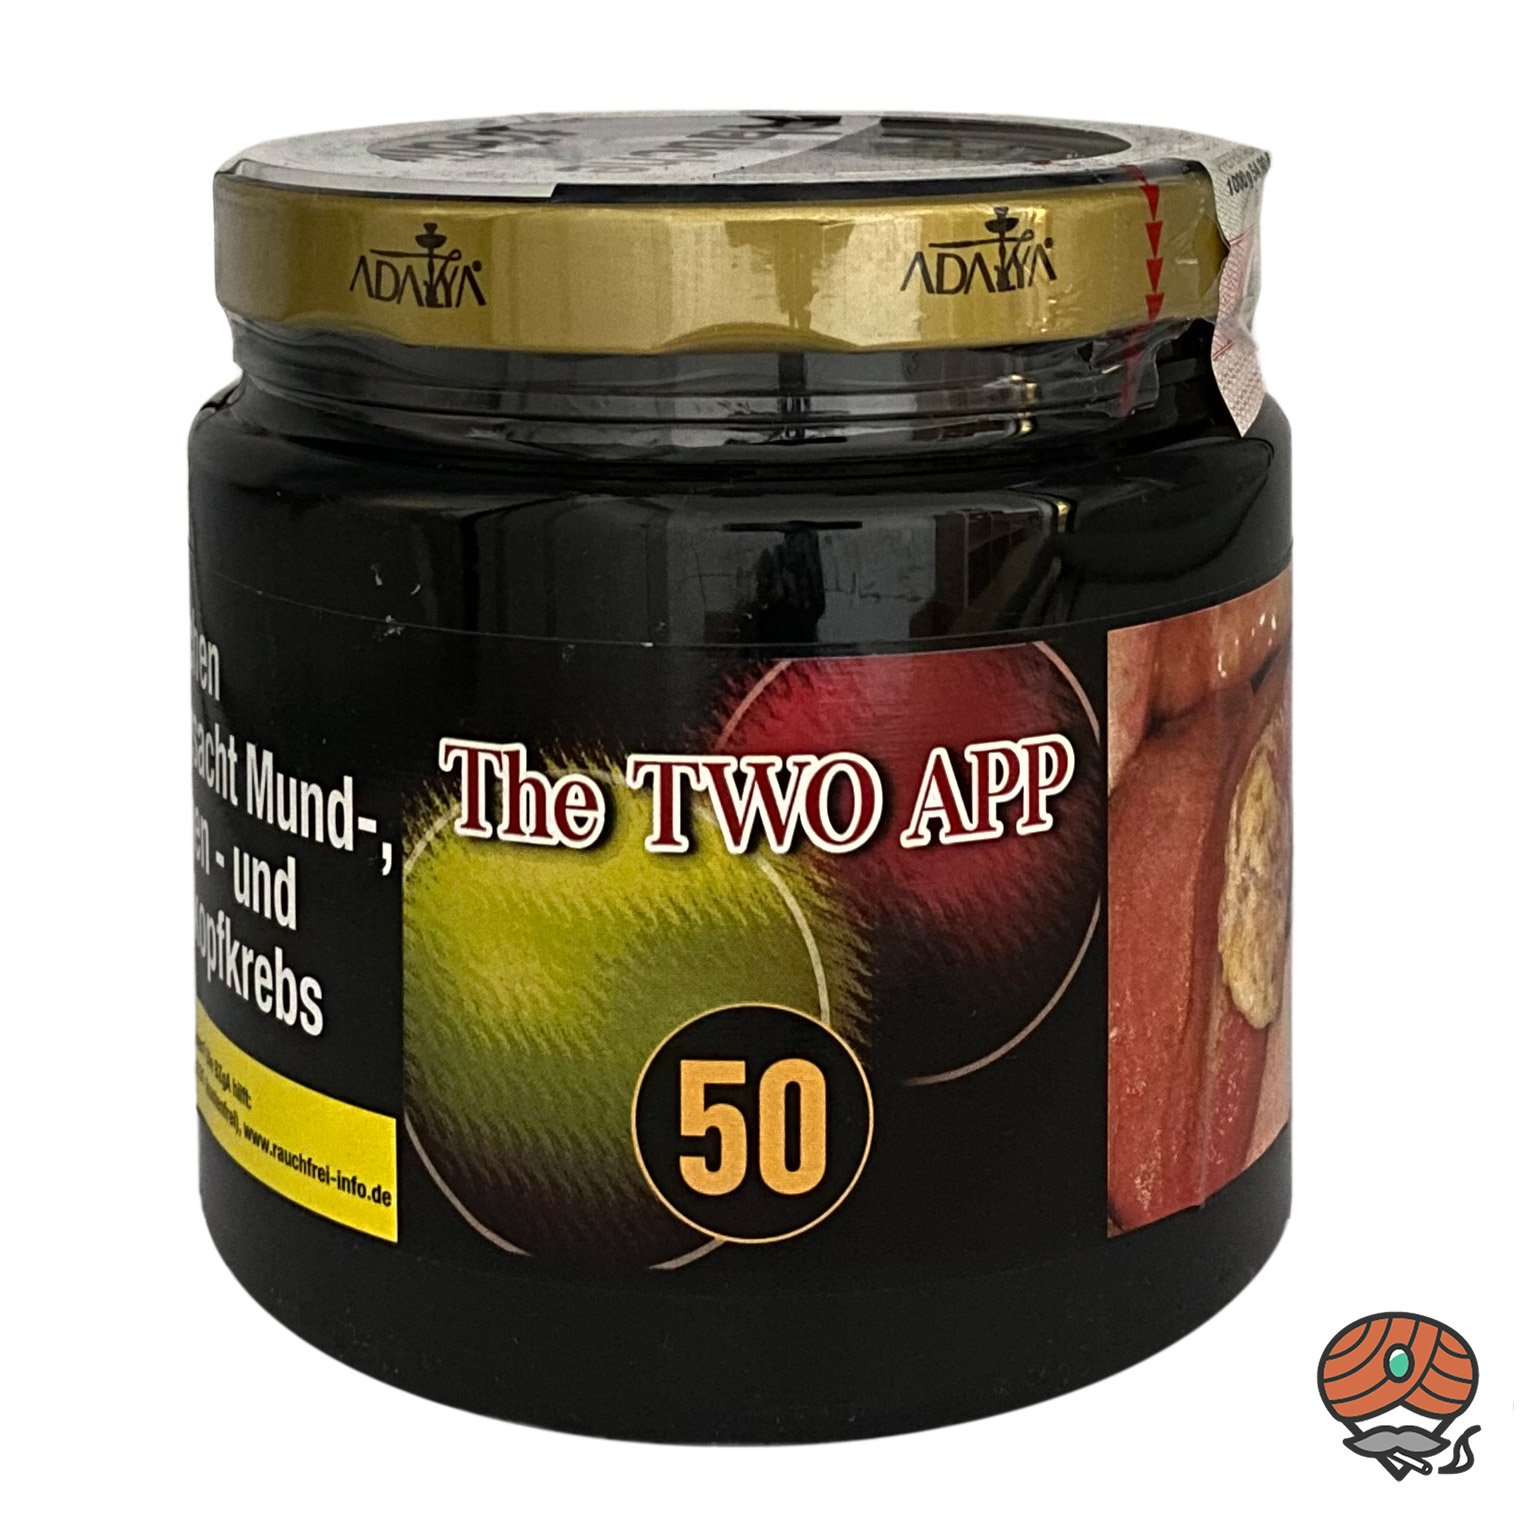 ADALYA The TWO APP #50 - 1000 g Shisha Tabak